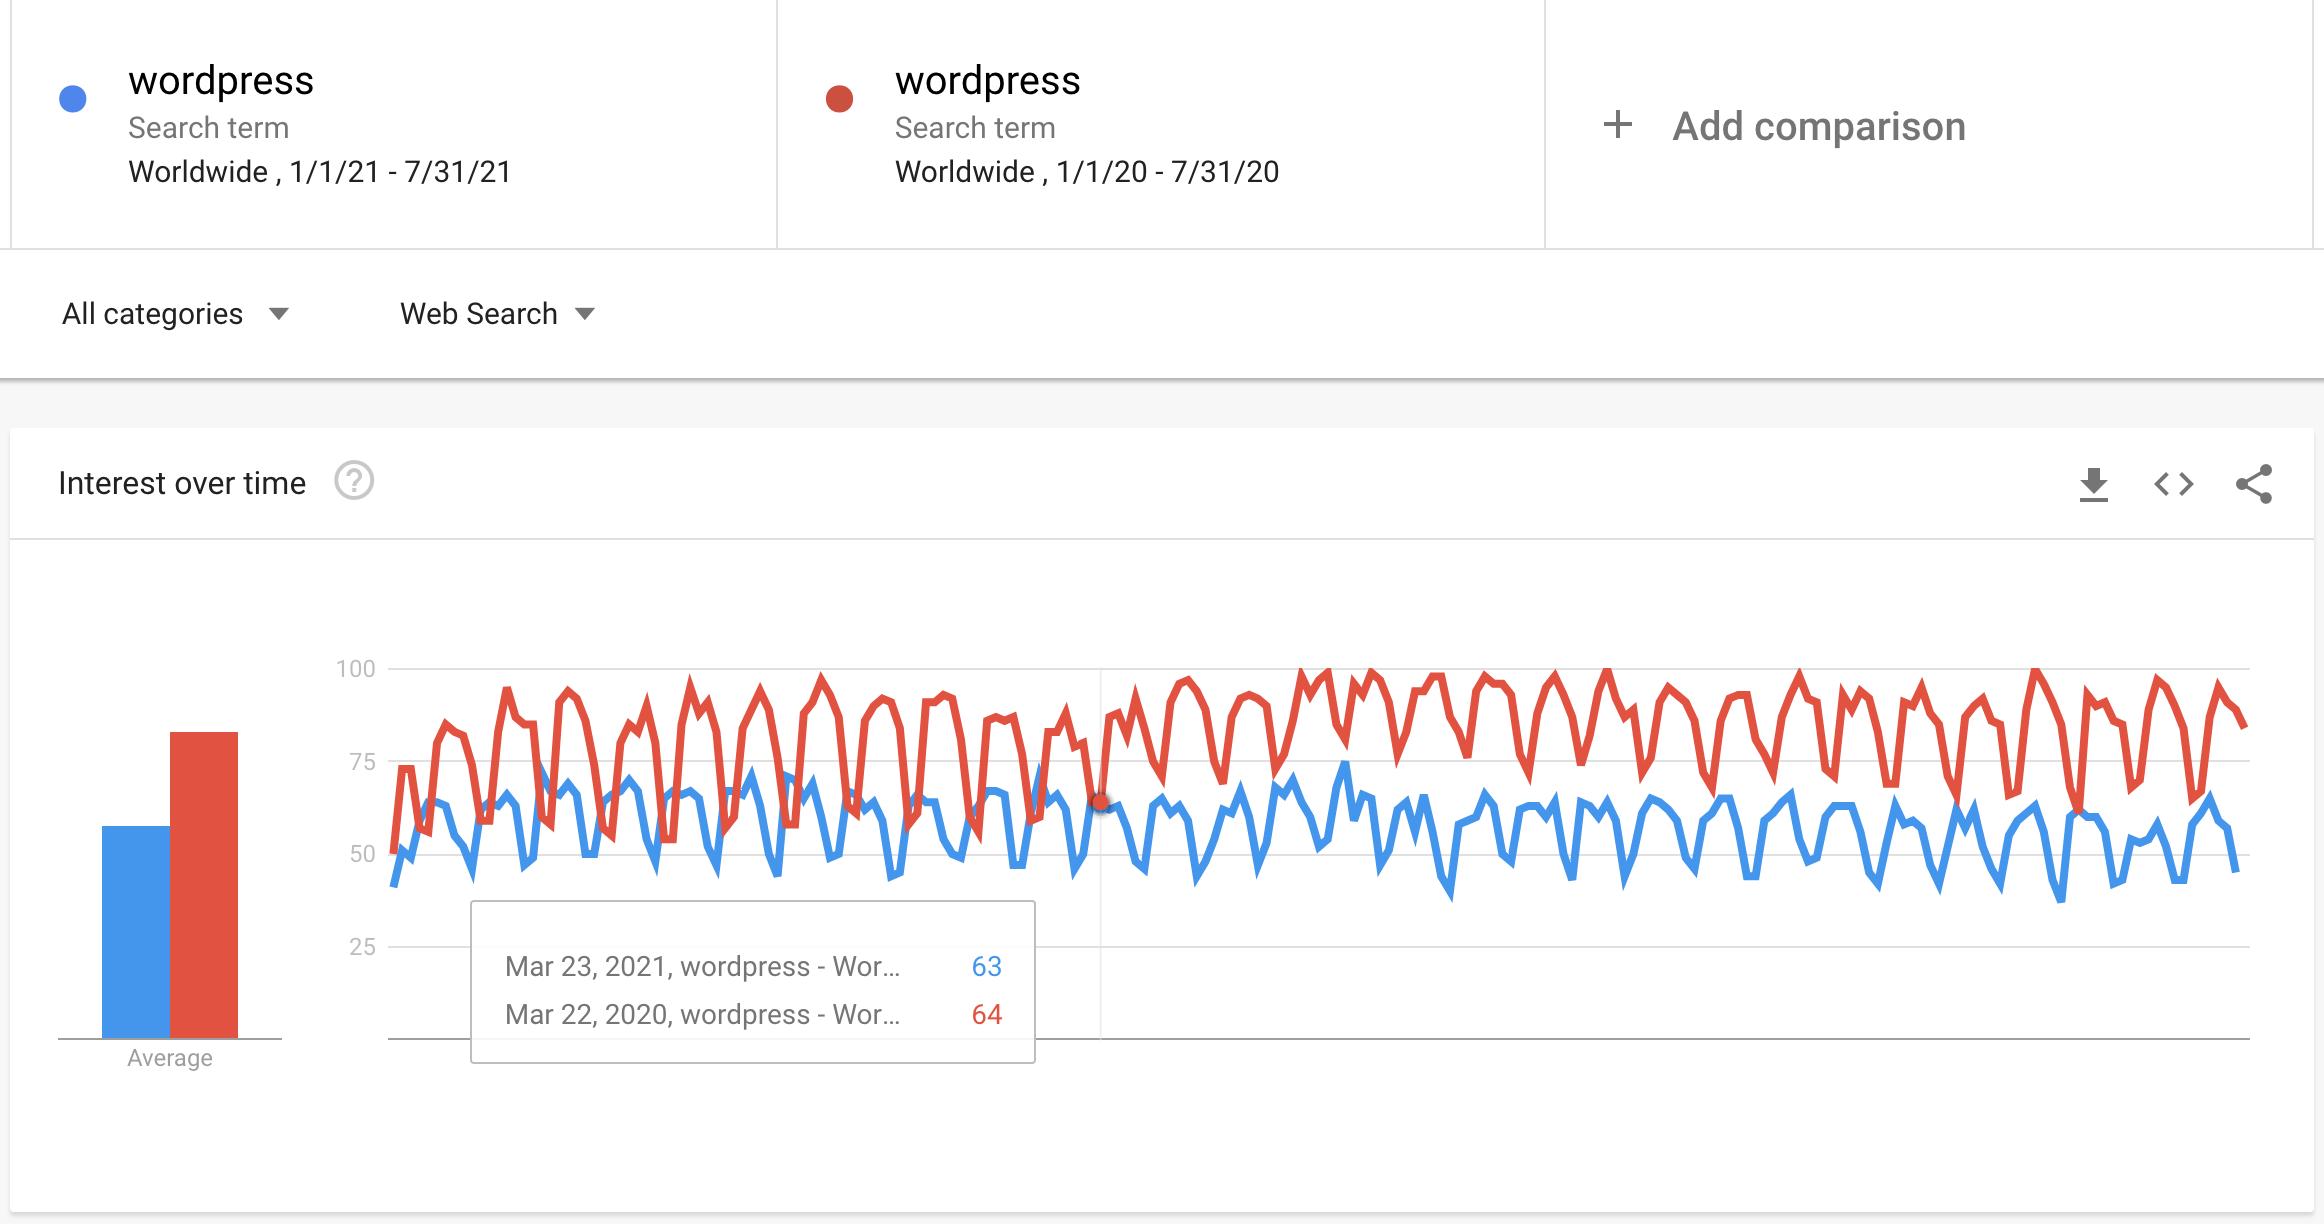 Google Trends WordPress decline